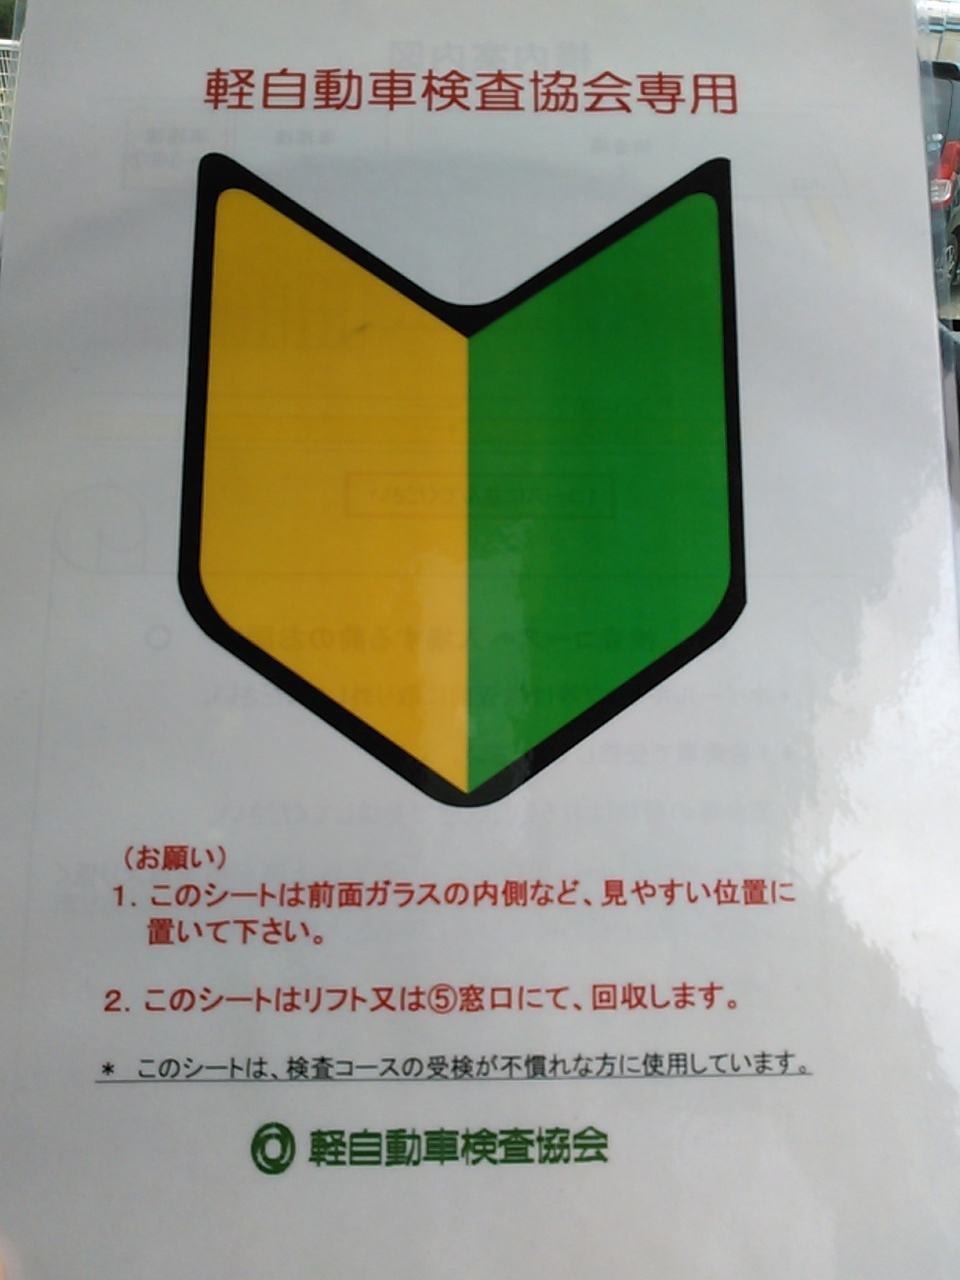 KIMG3001.jpg